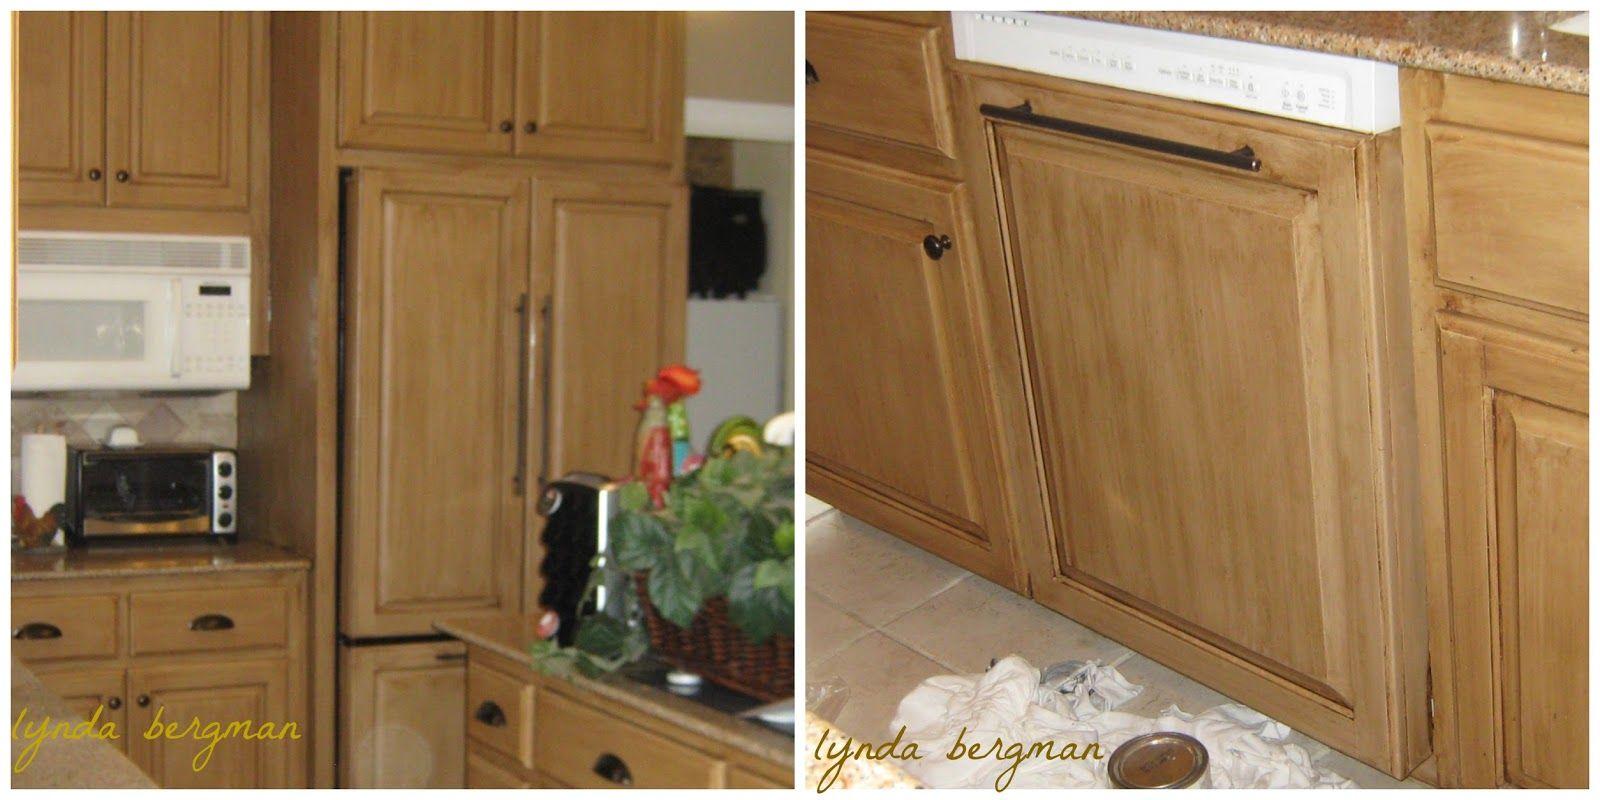 Lynda Bergman Decorative Artisan Matching New Wood To An Older Finish On Shannon S Kitchen Cabinets Kitchen Cabinets Kitchen Cabinet